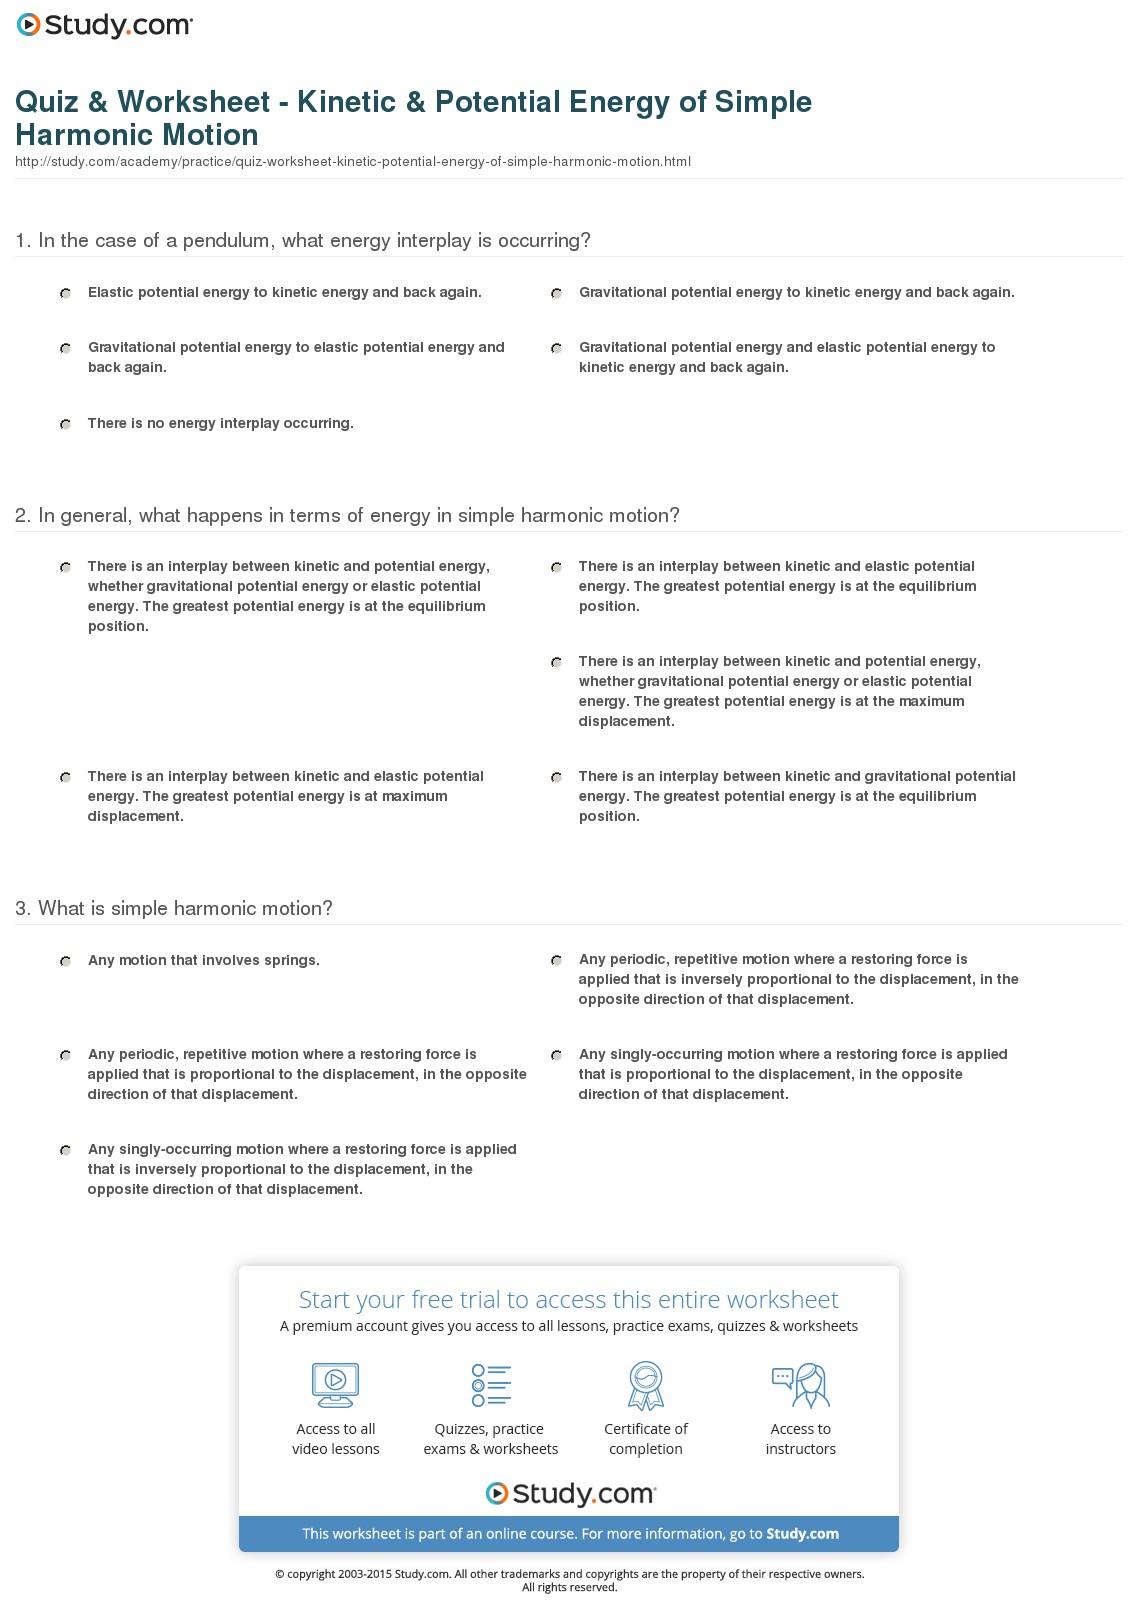 Quiz Worksheet Kinetic Potential Energy Of Simple Harmonic